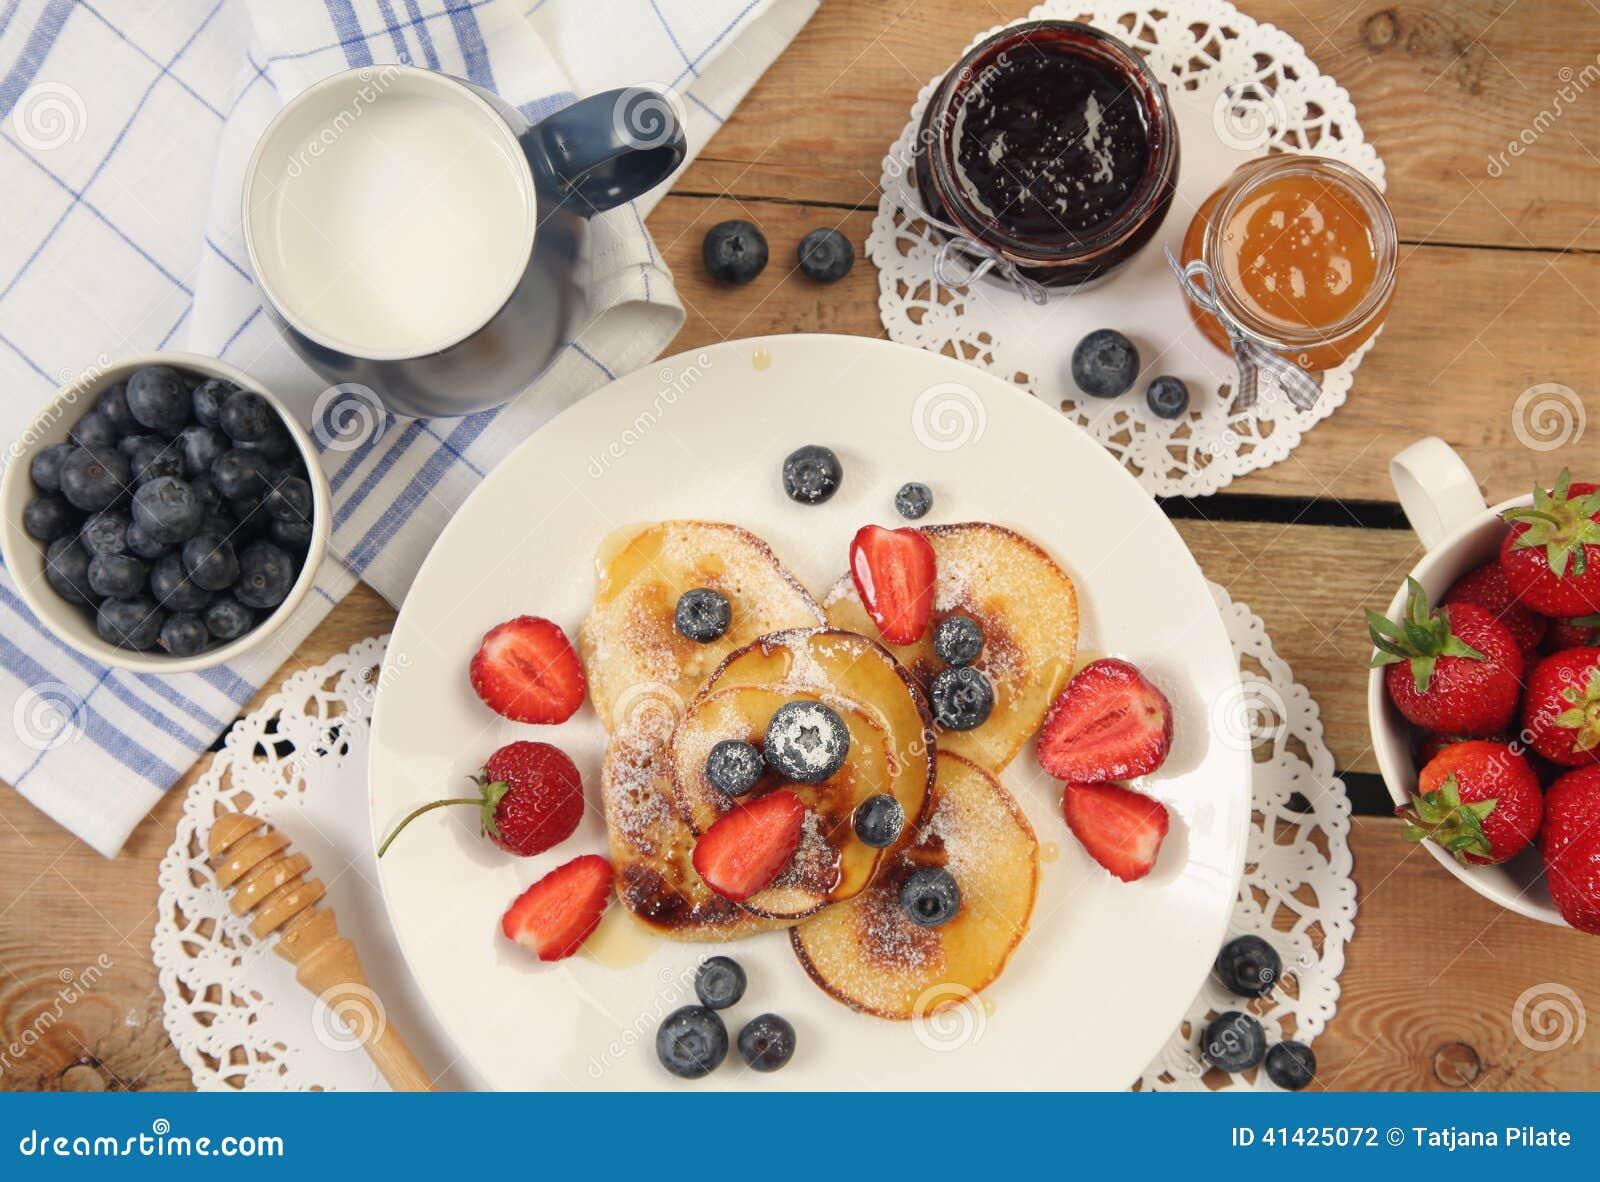 Таблица с завтраком